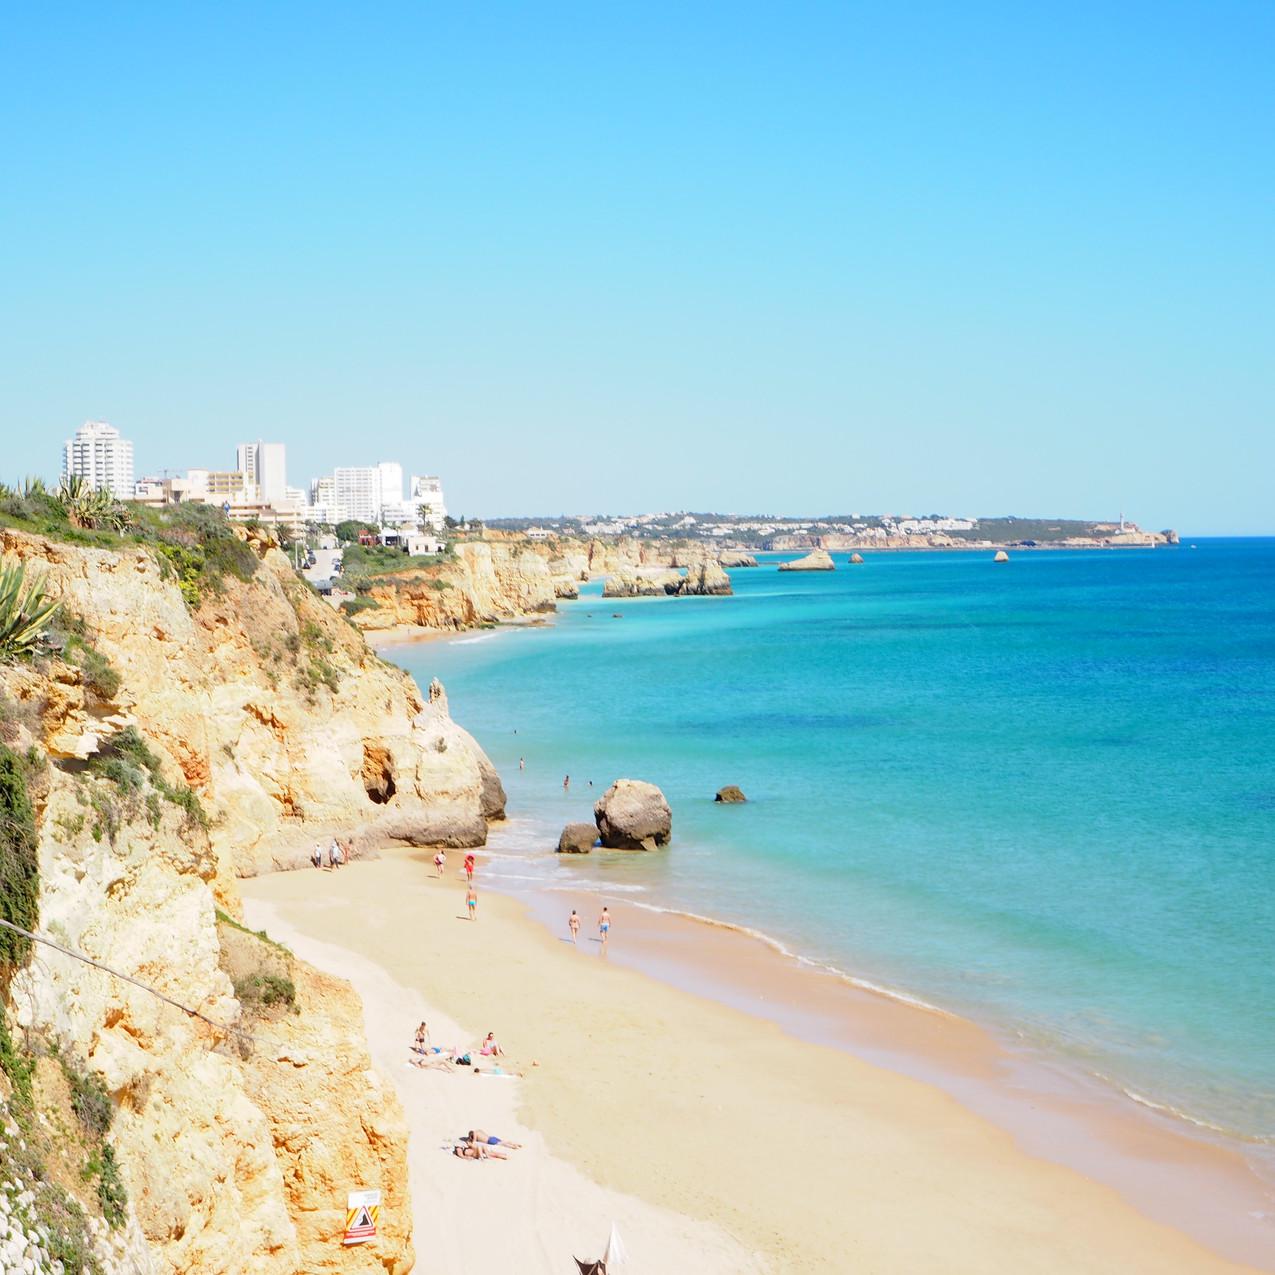 Praia do Barranco das Canas